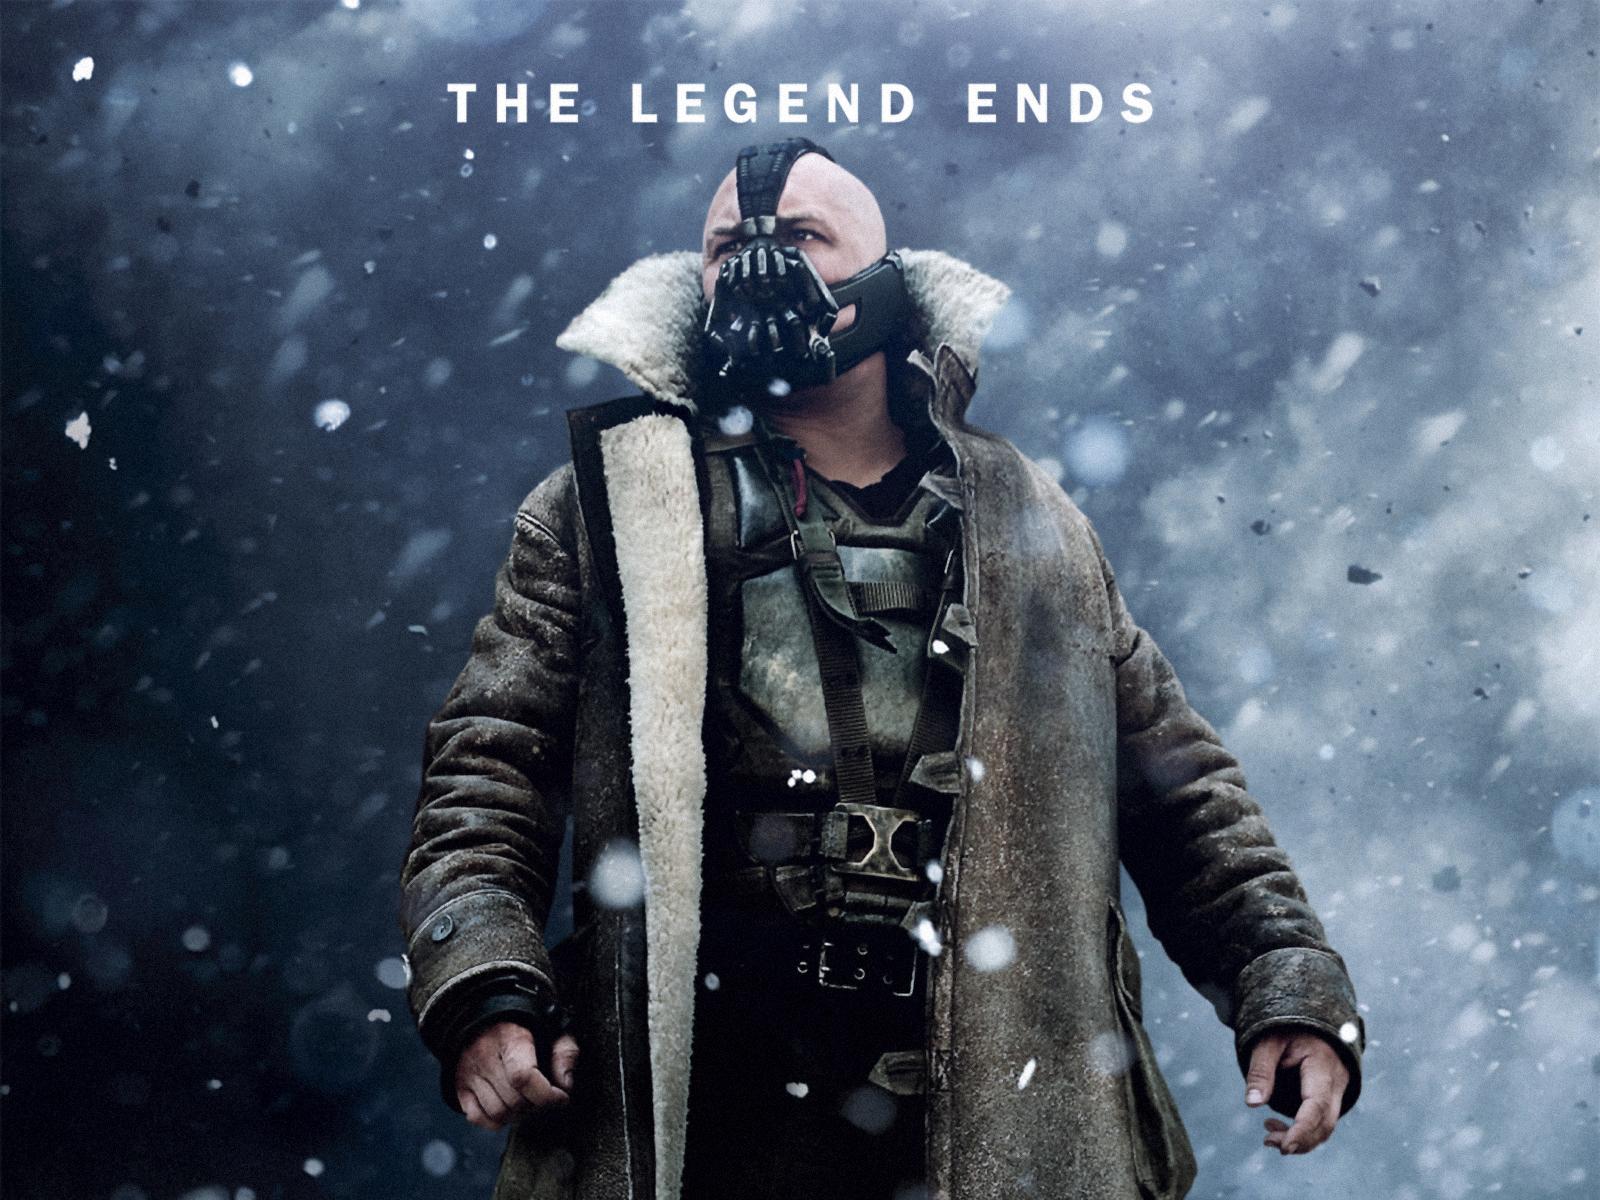 The Dark Knight Rises 2012 Tom Hardy As Bane